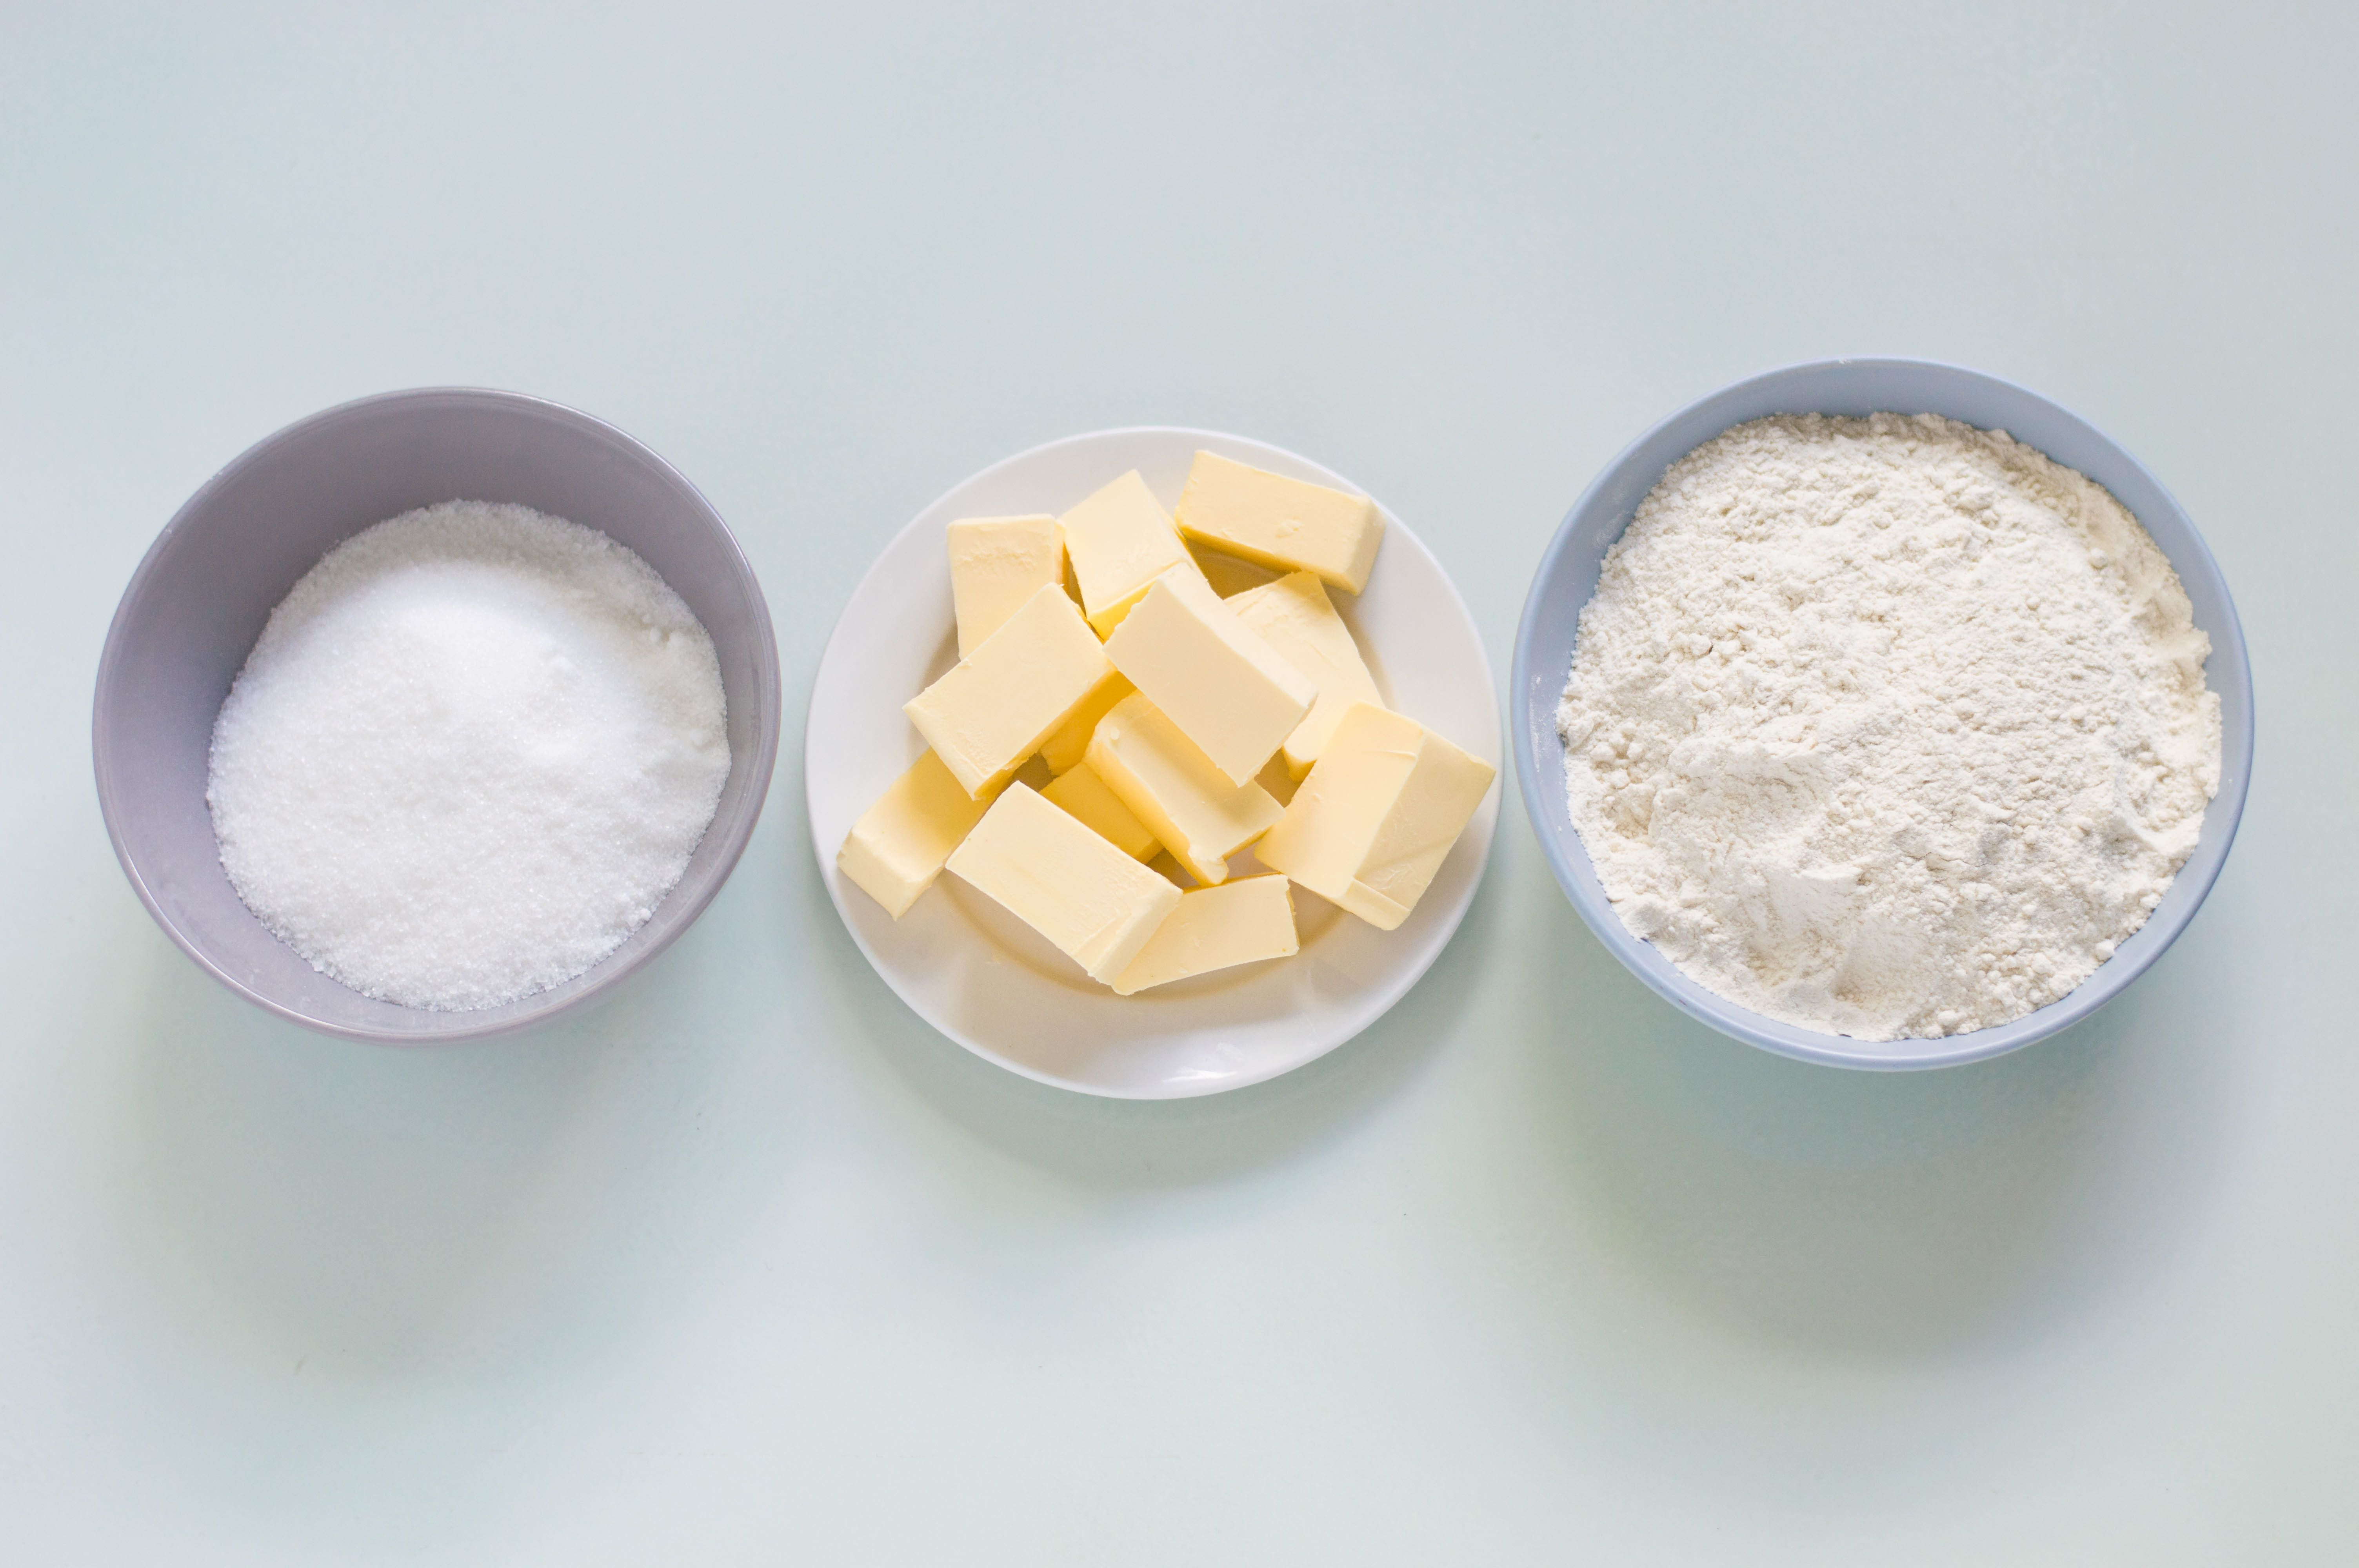 Ingredients for shortbread